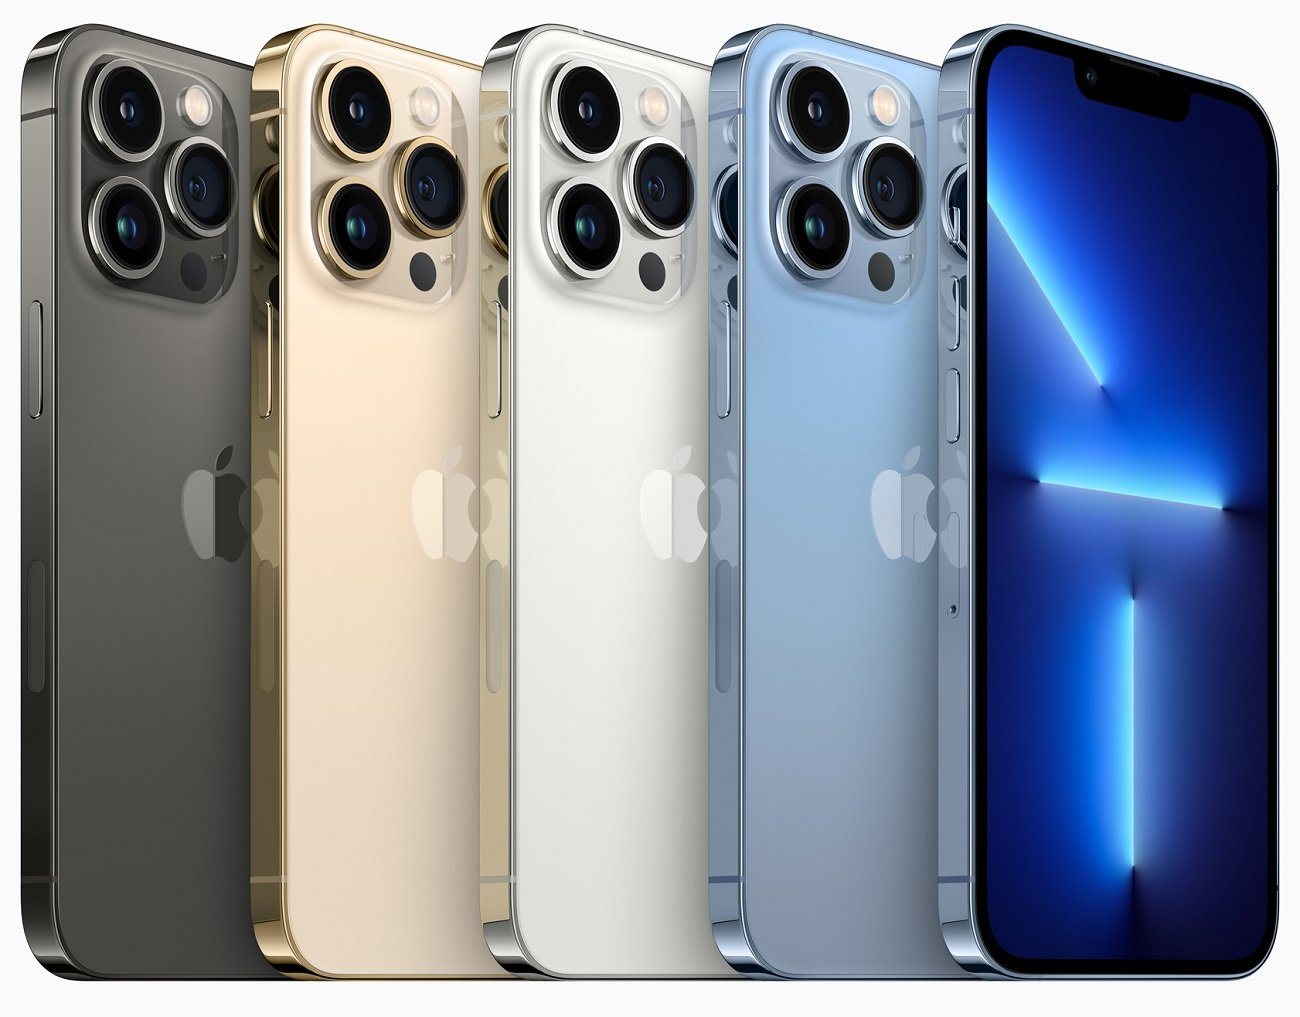 apple-iphone-13-pro-colors-09142021.jpg